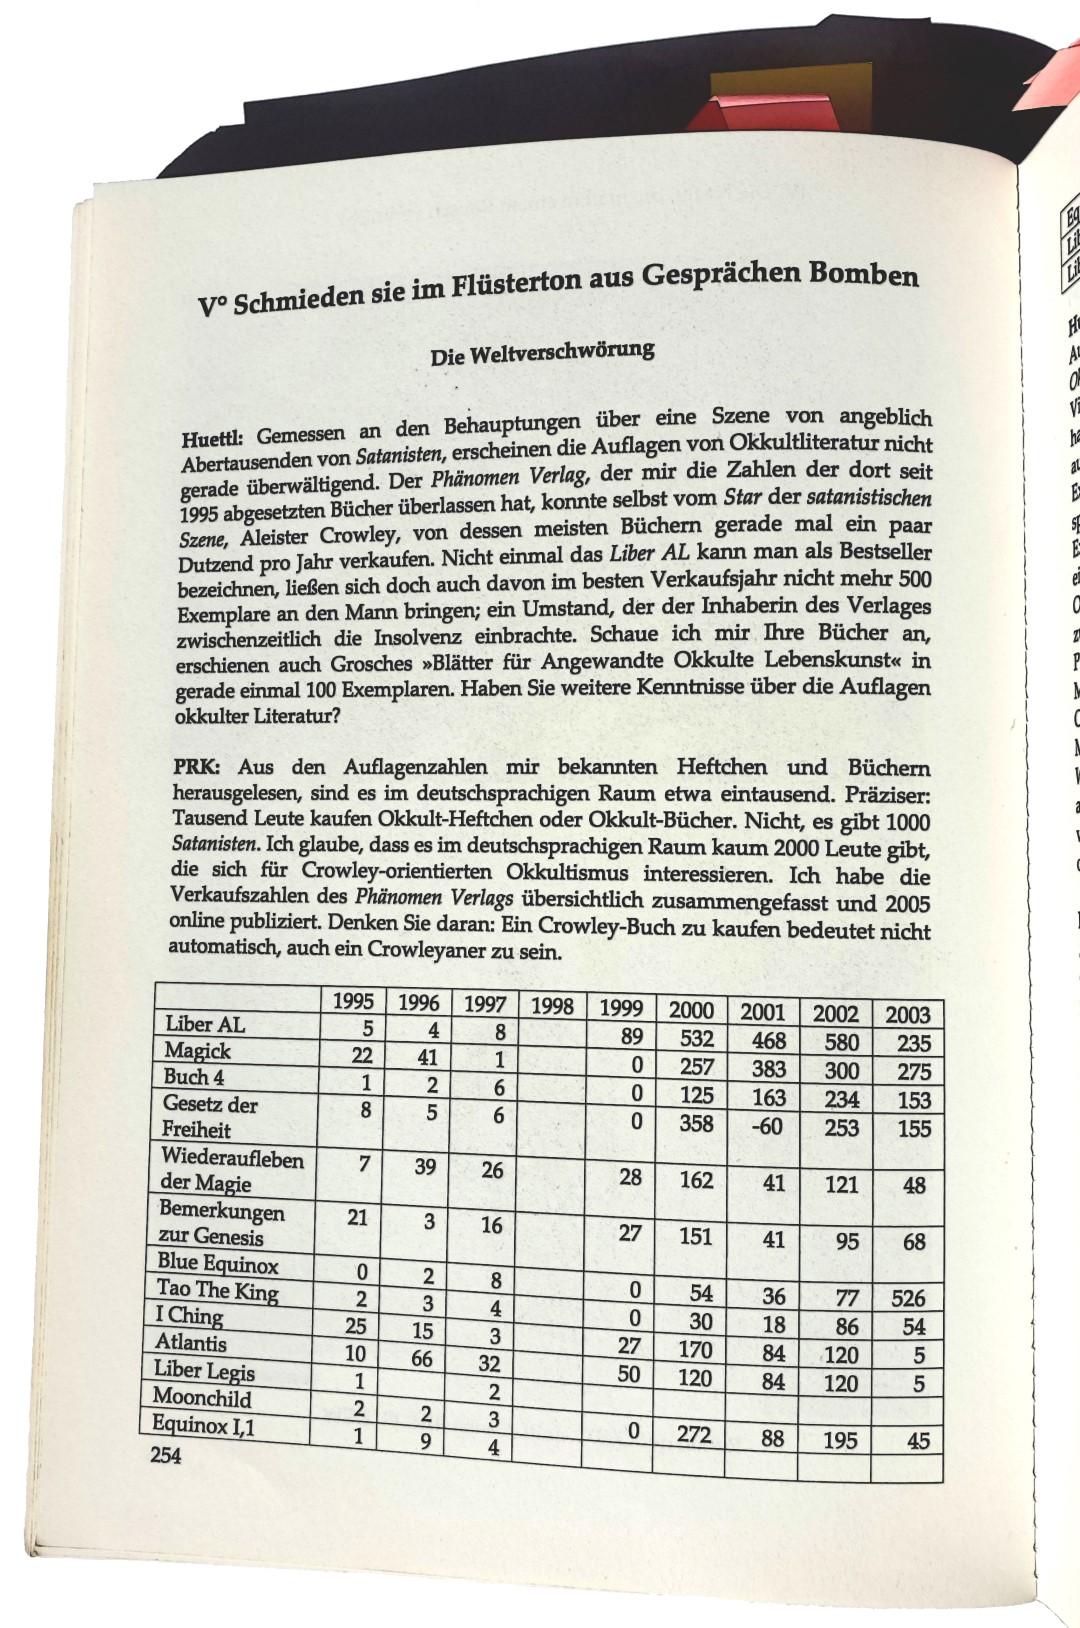 Andreas Huettl Peter-R. König SATAN Jünger, Jäger und Justiz Phaenomen Verlag William Breeze Caliphate Ordo Templi Orientis